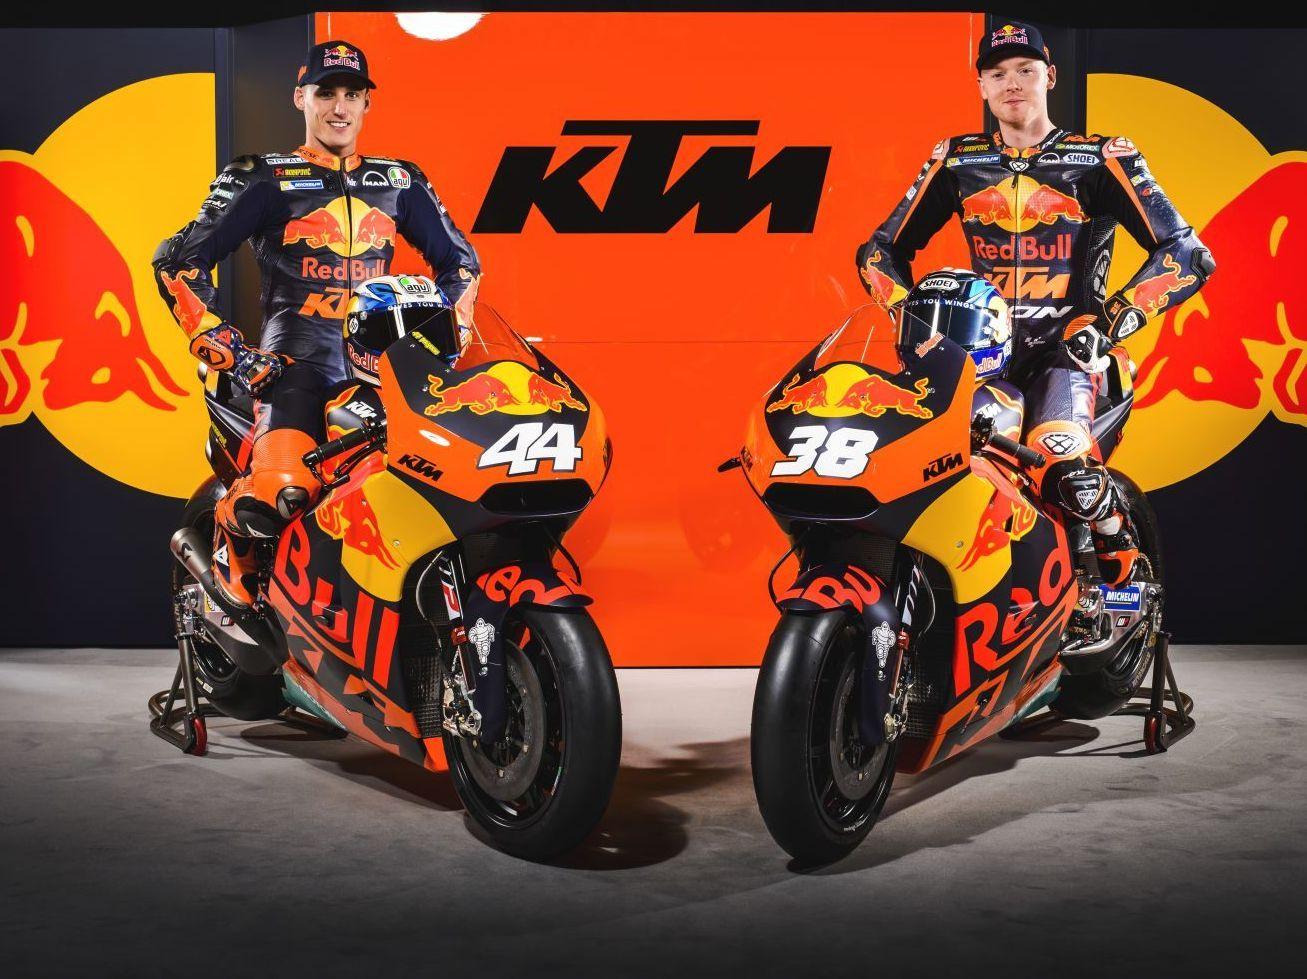 See The New Red Bull Ktm Factory Team Motogp Bikes Ktm Factory Ktm Motogp